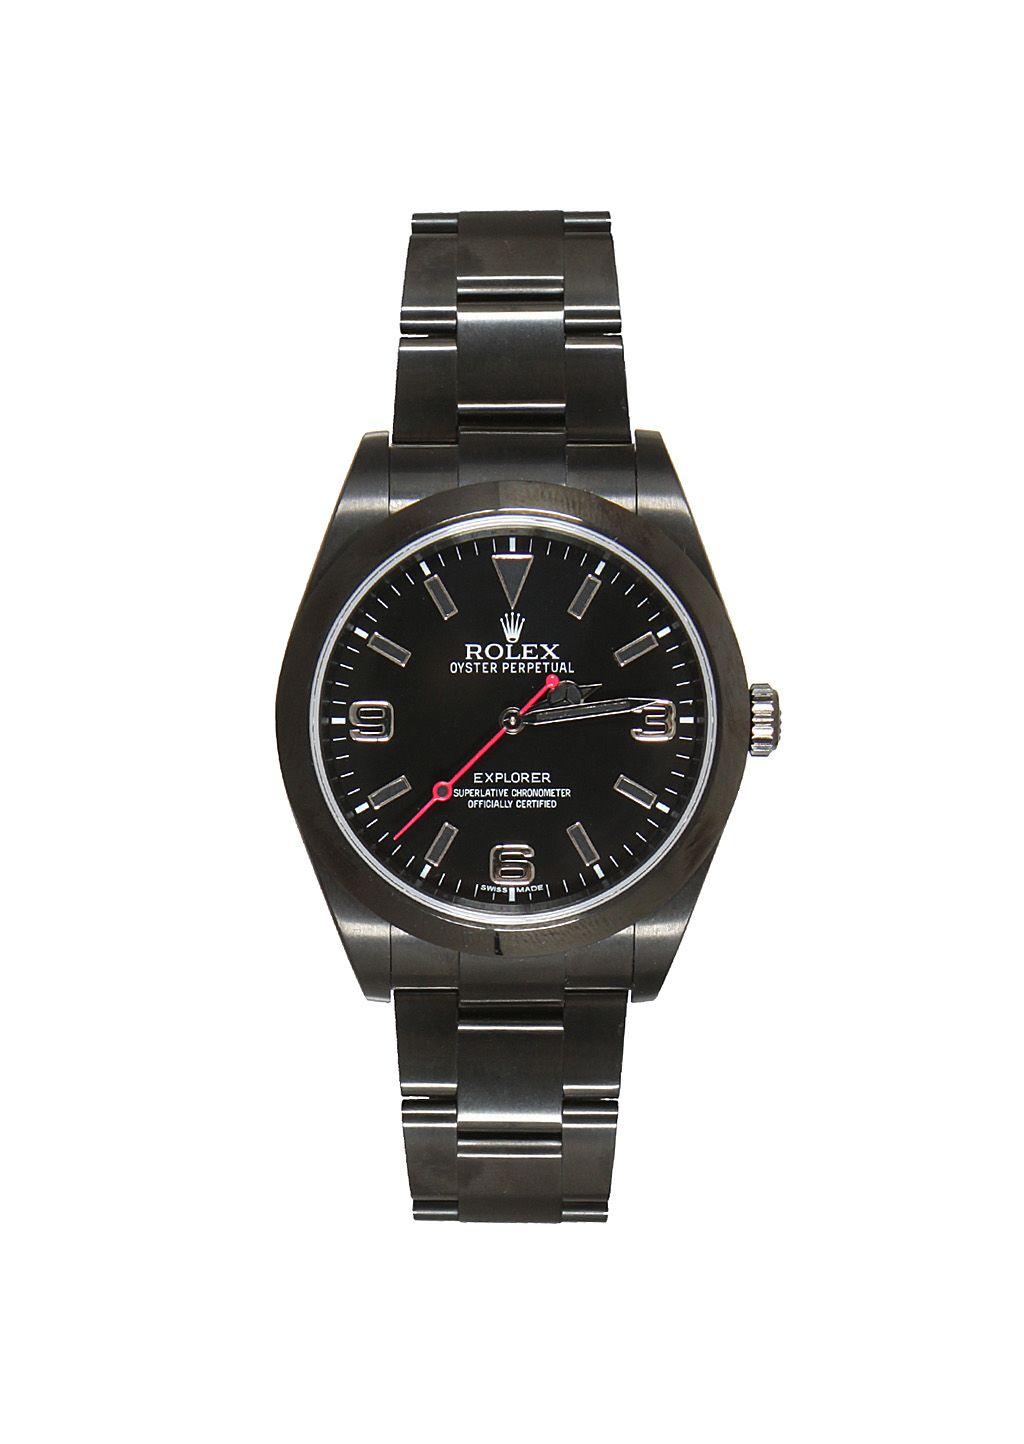 Customized watches Watches :: Rolex Explorer customized watch | Montaigne Market